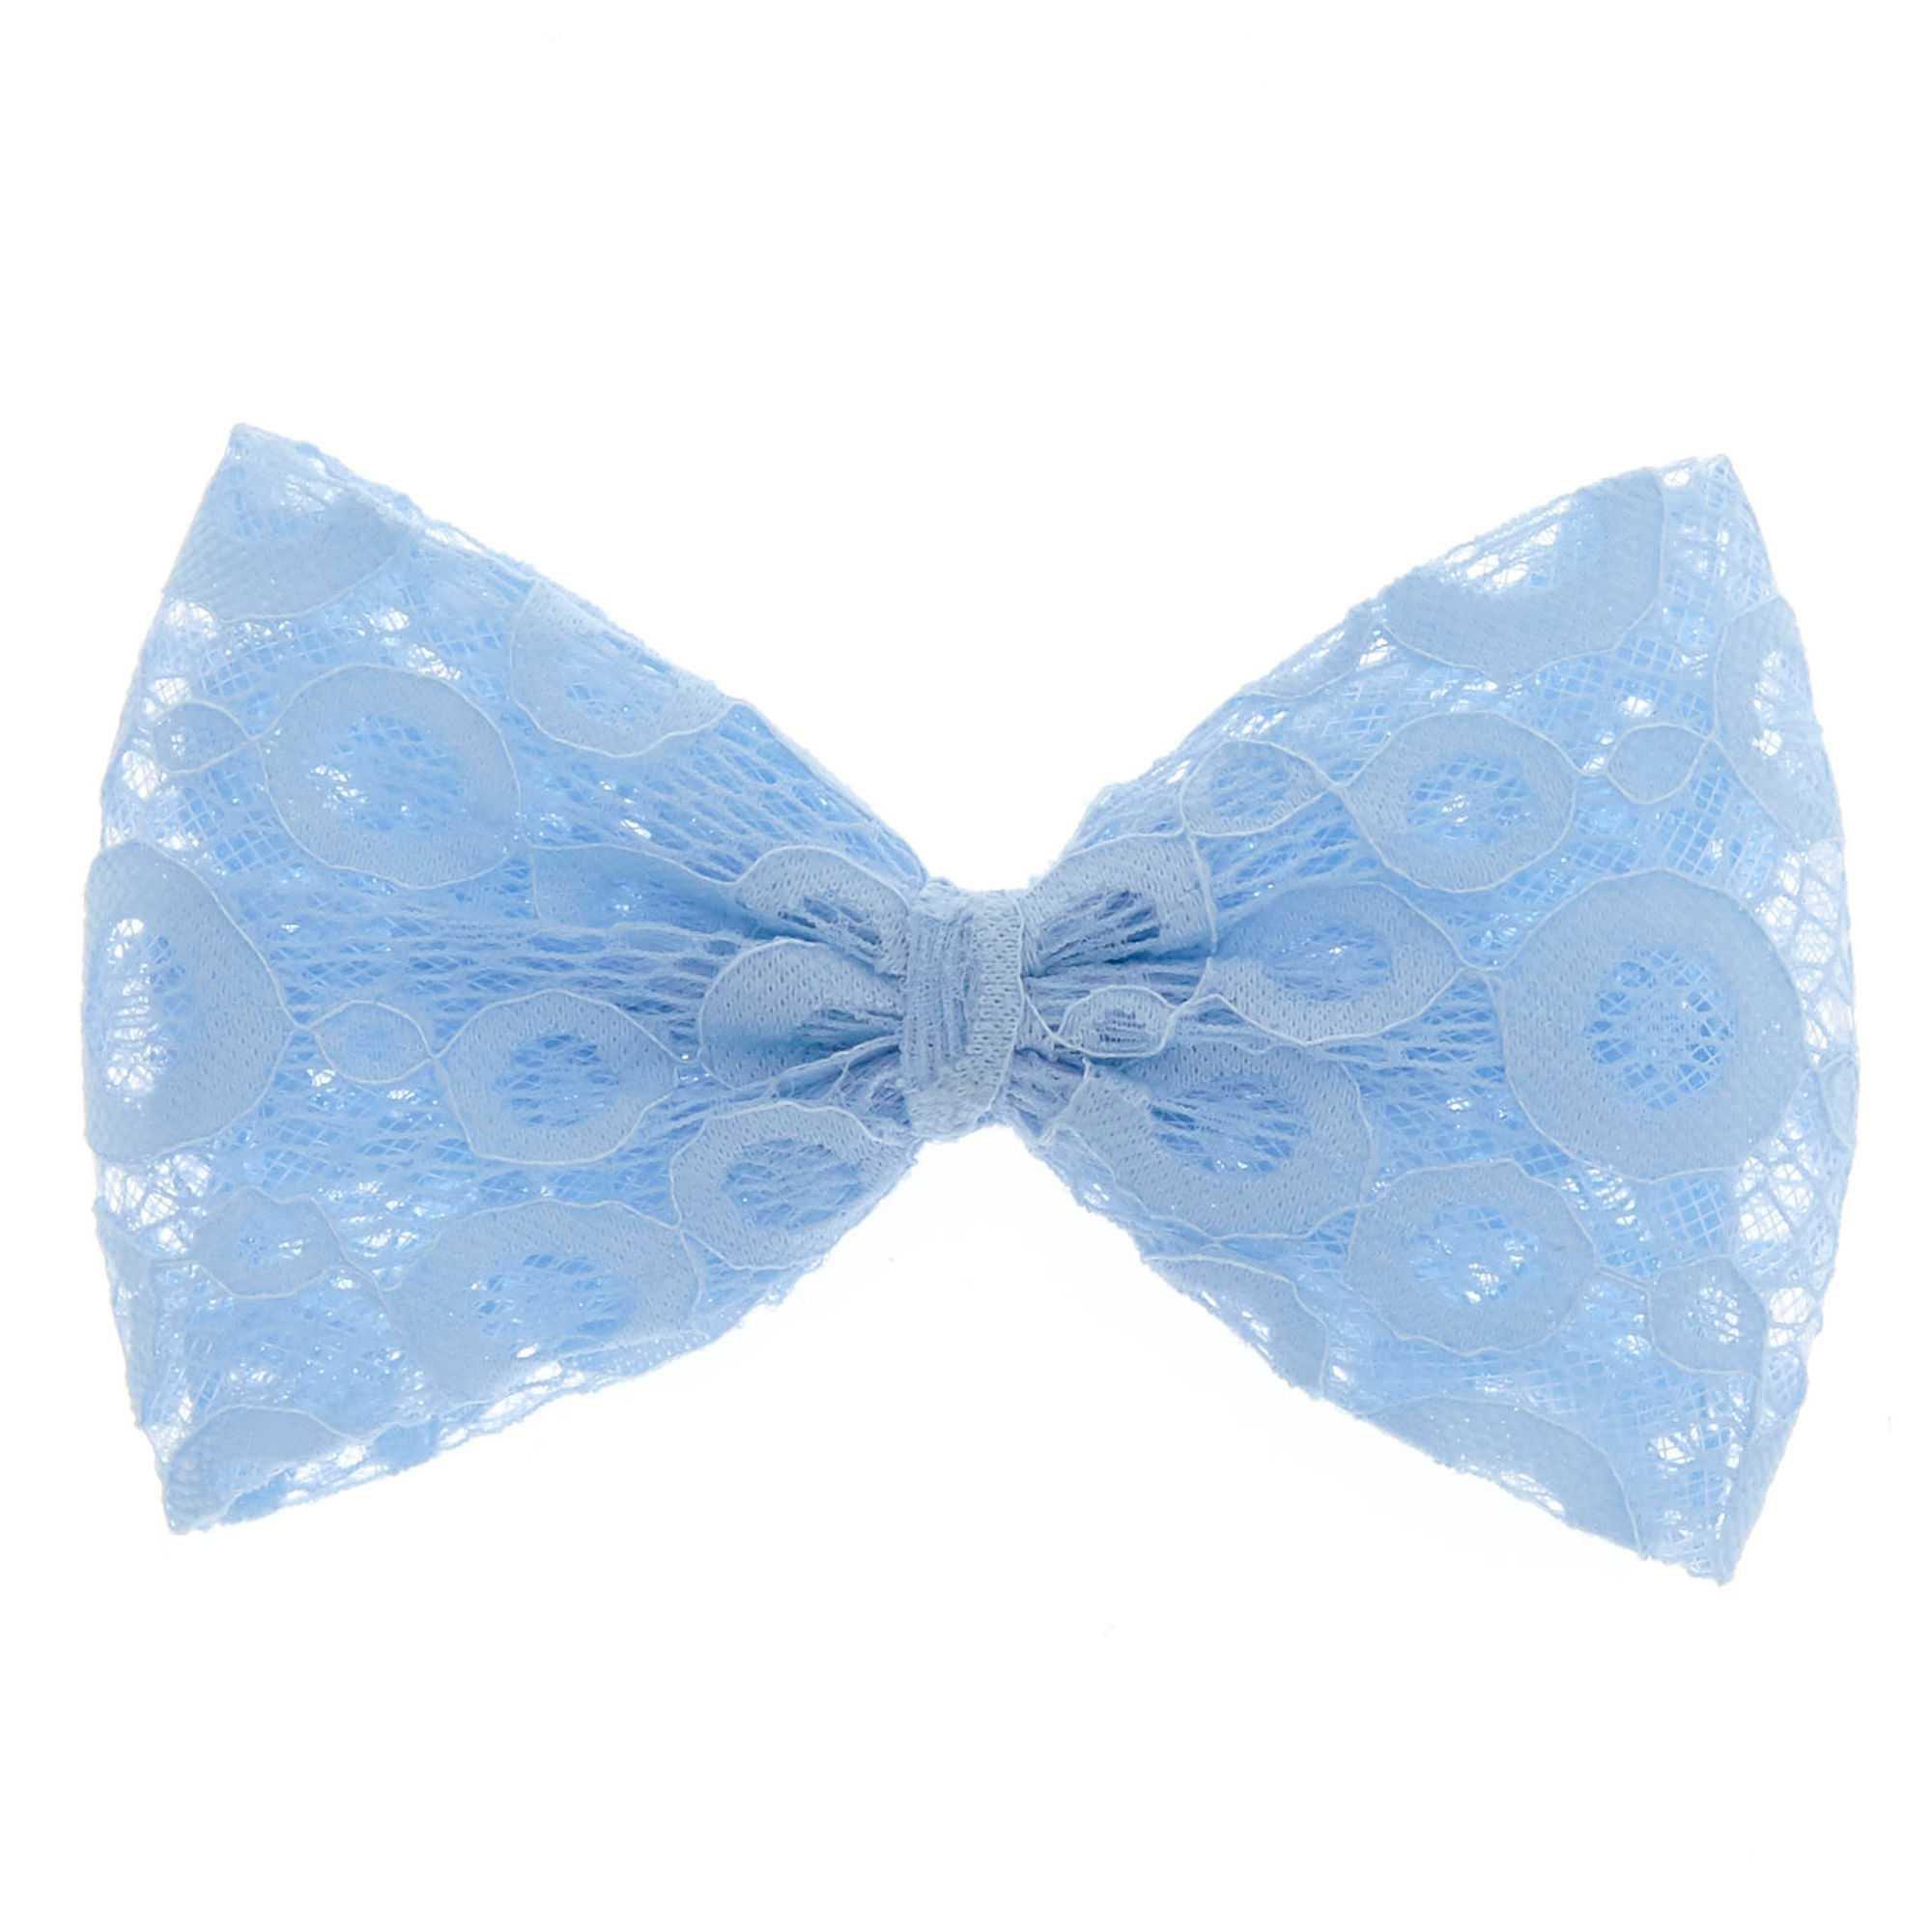 https://www.icing.com/us/powder-blue-lace-bow-hair-clip-125975.html#q=bow&lang=en_US&start=12